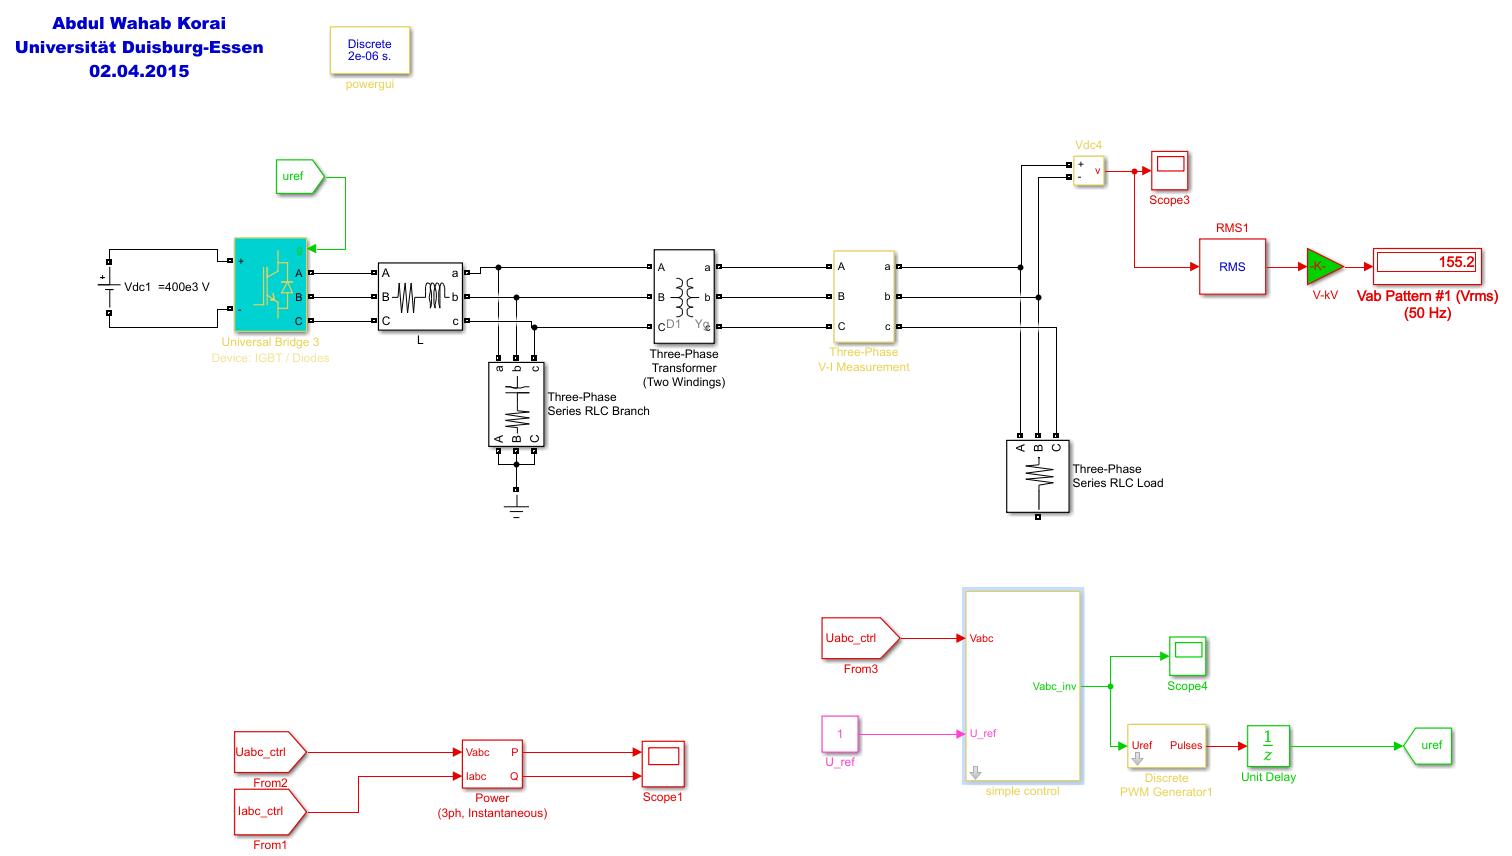 Abdul Wahab Matlab Central Discrete Pwm Generator Circuit Thumbnail